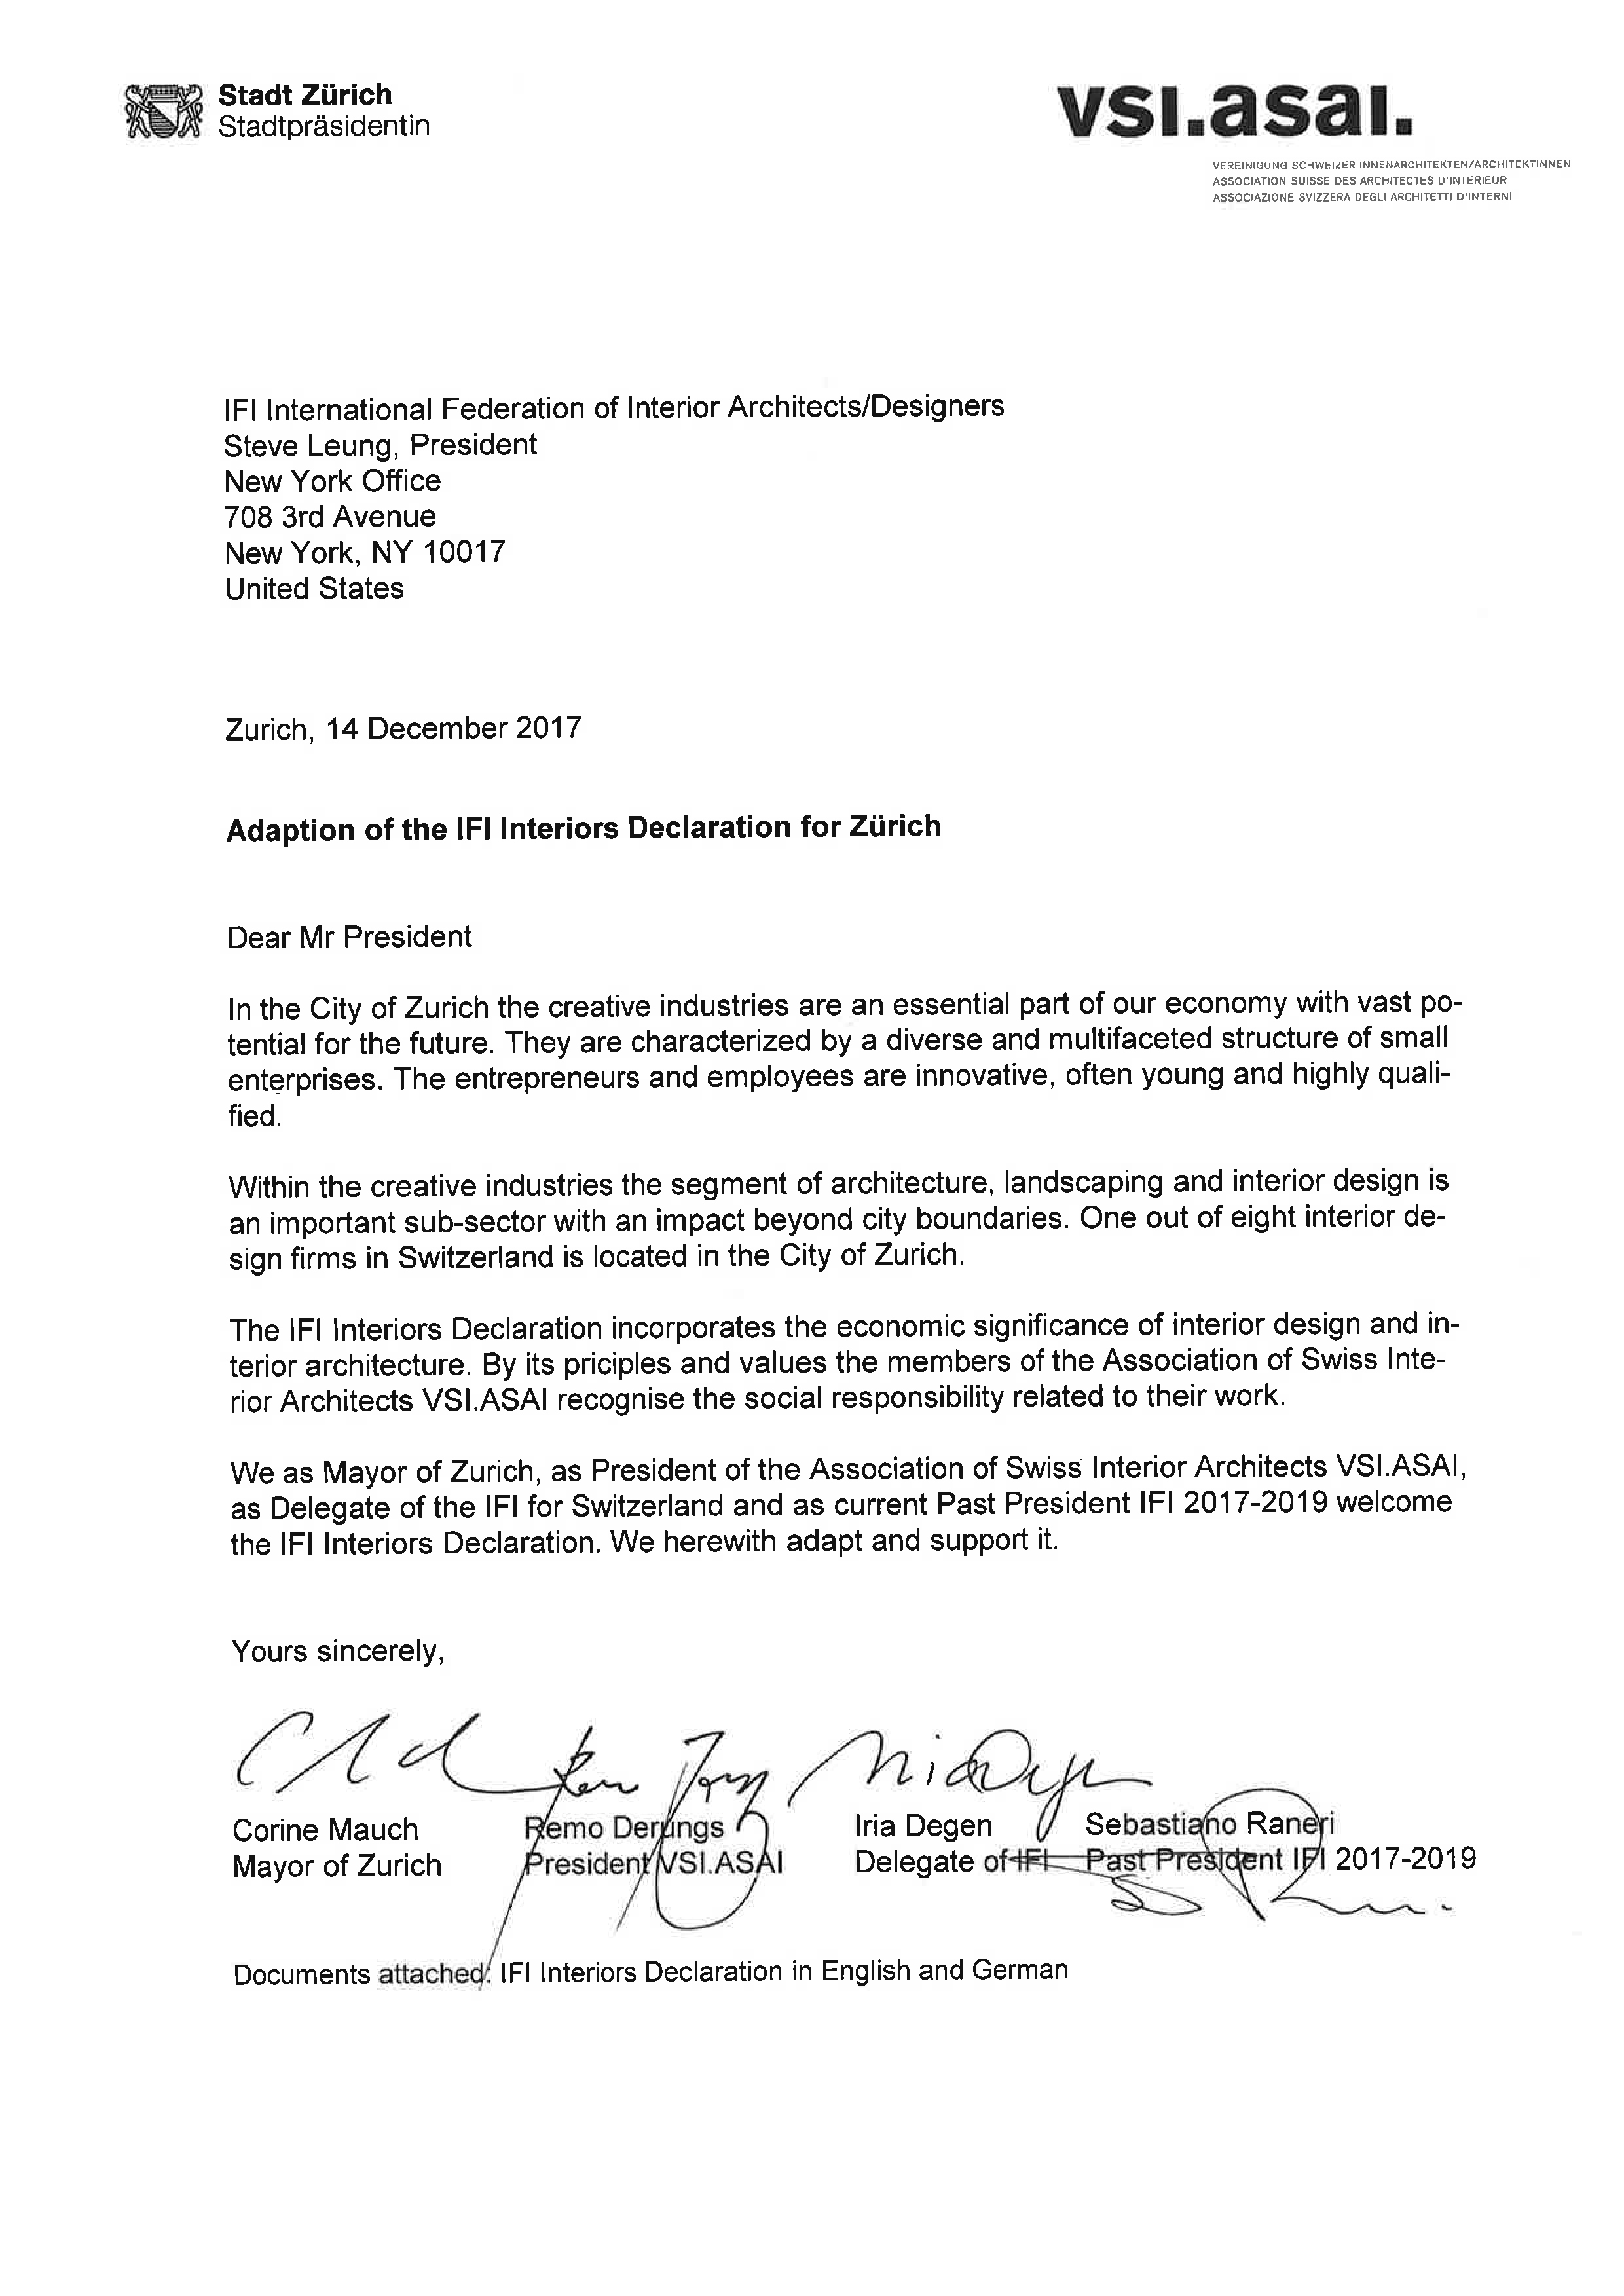 Signed IFI Interiors Declaration for Zürich-1.jpg